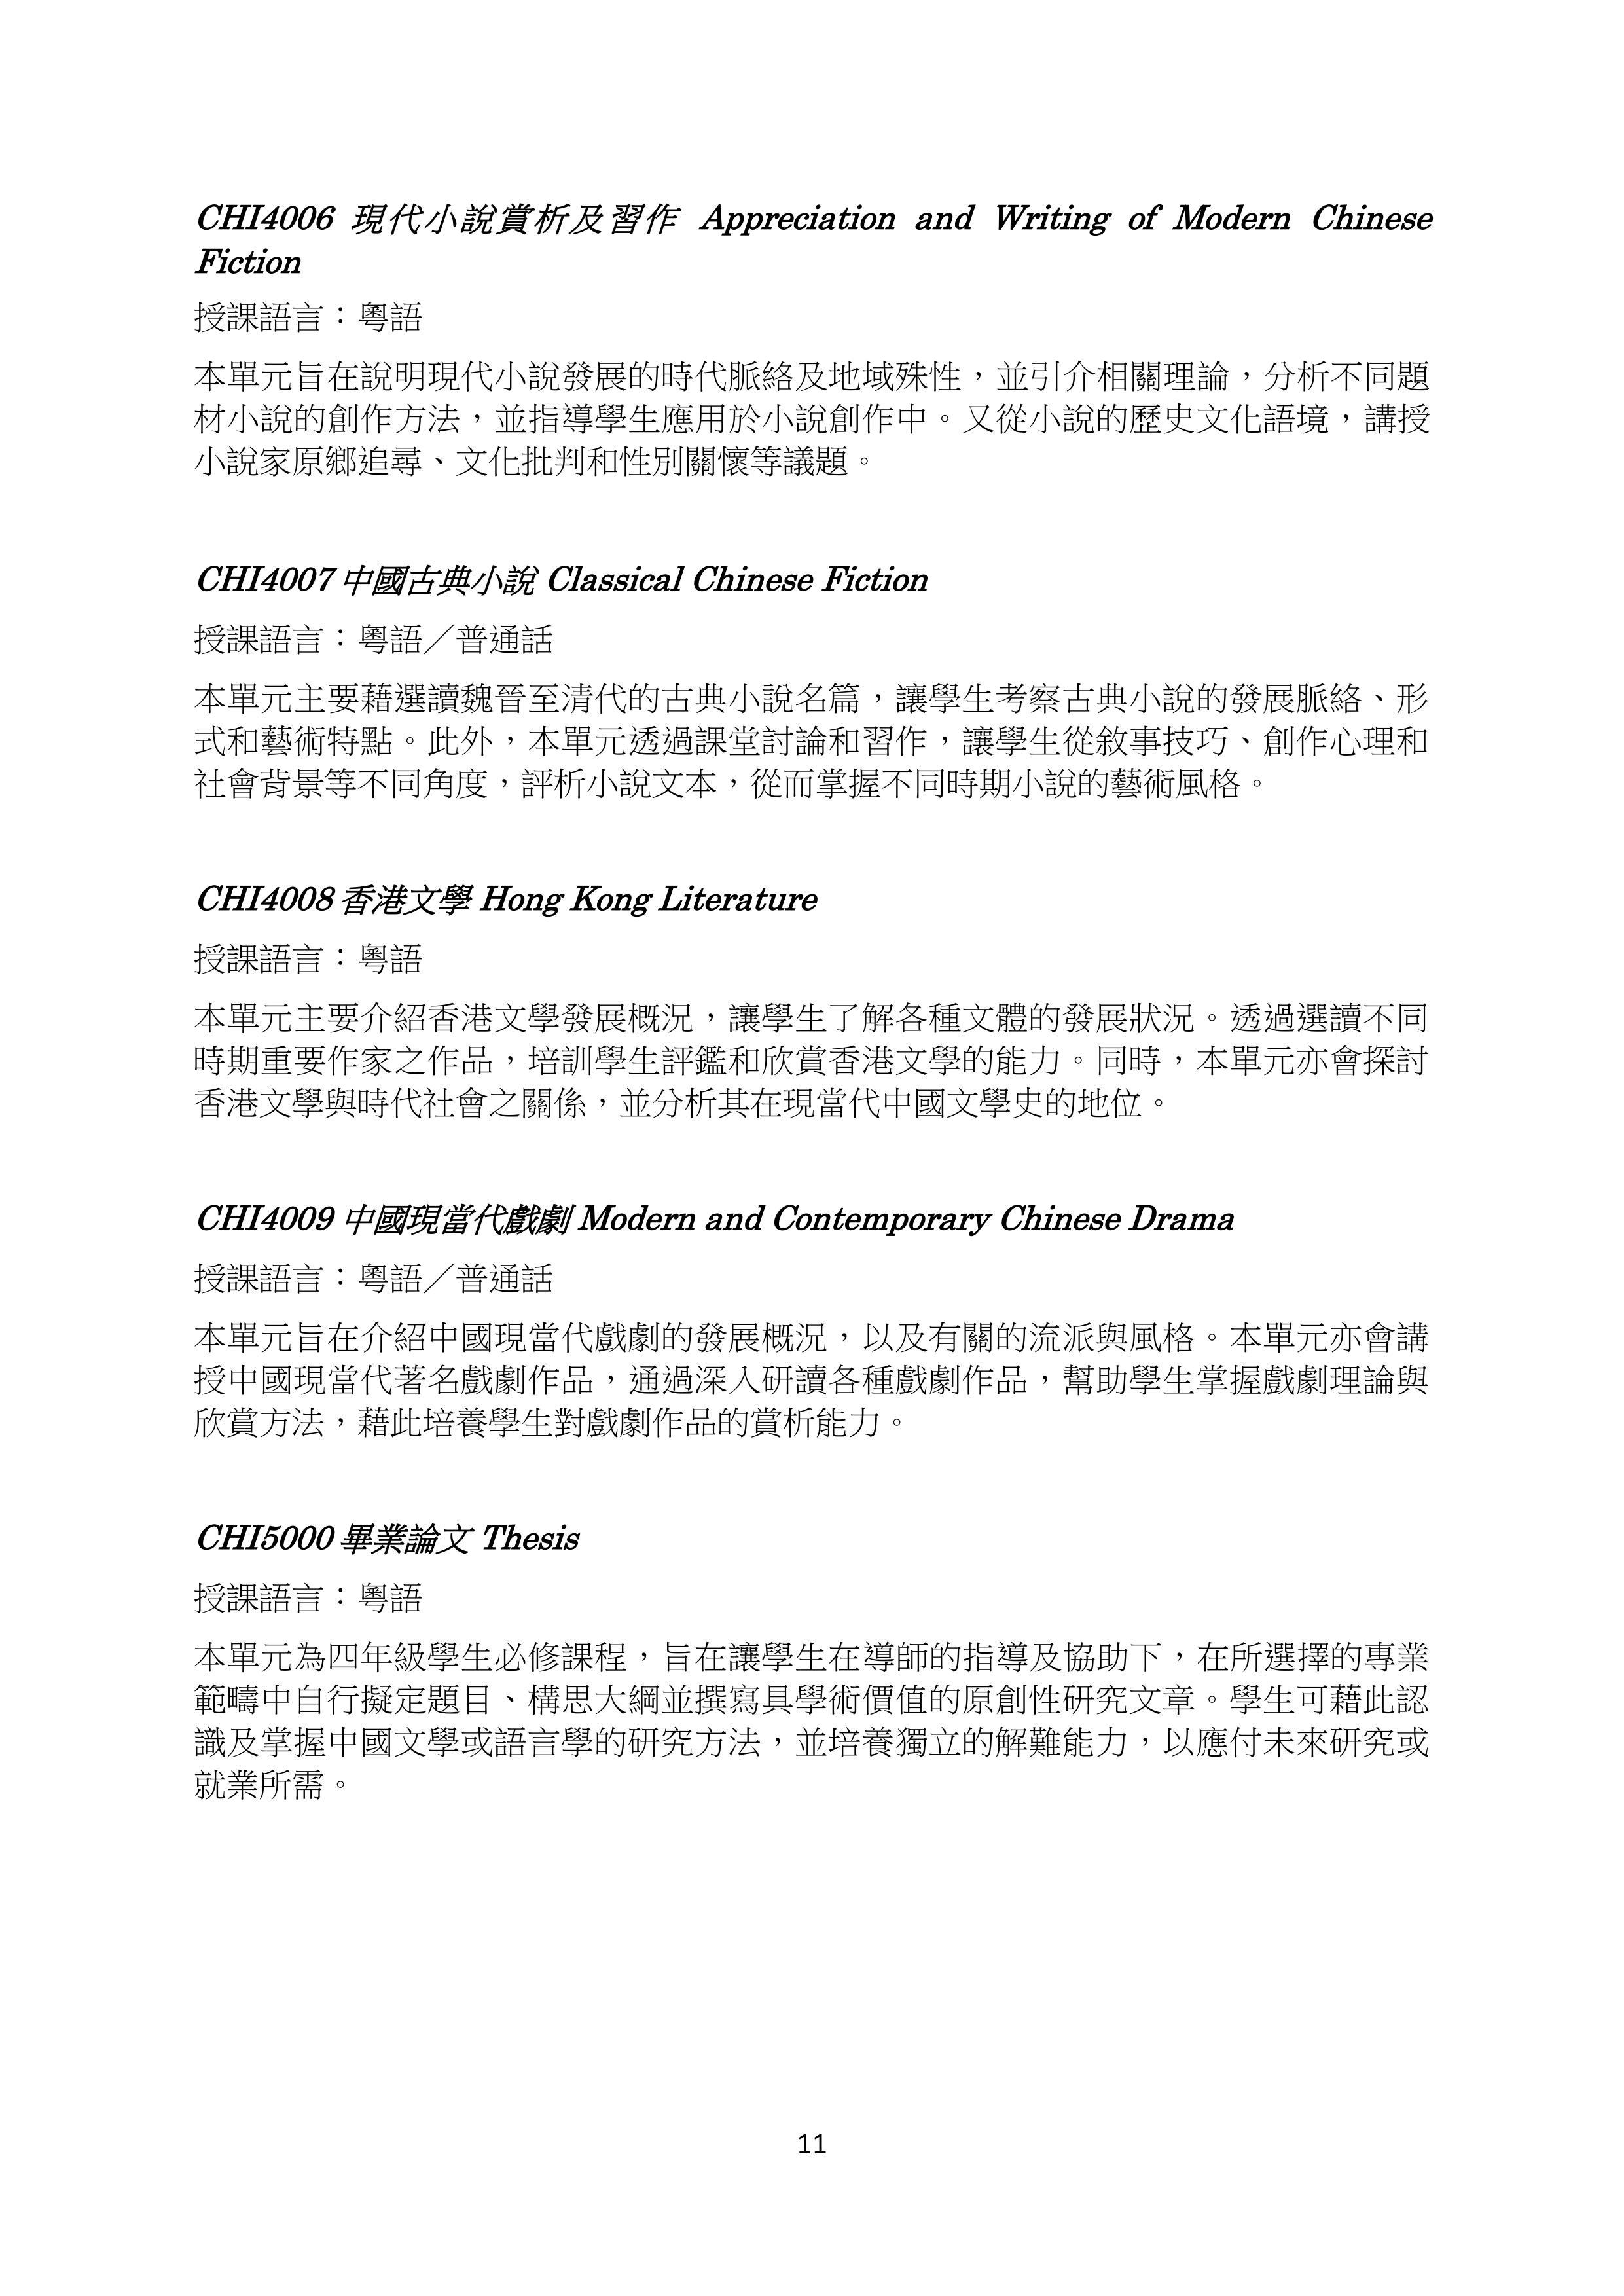 BA-CHI Programme Handbook-2018-19_13